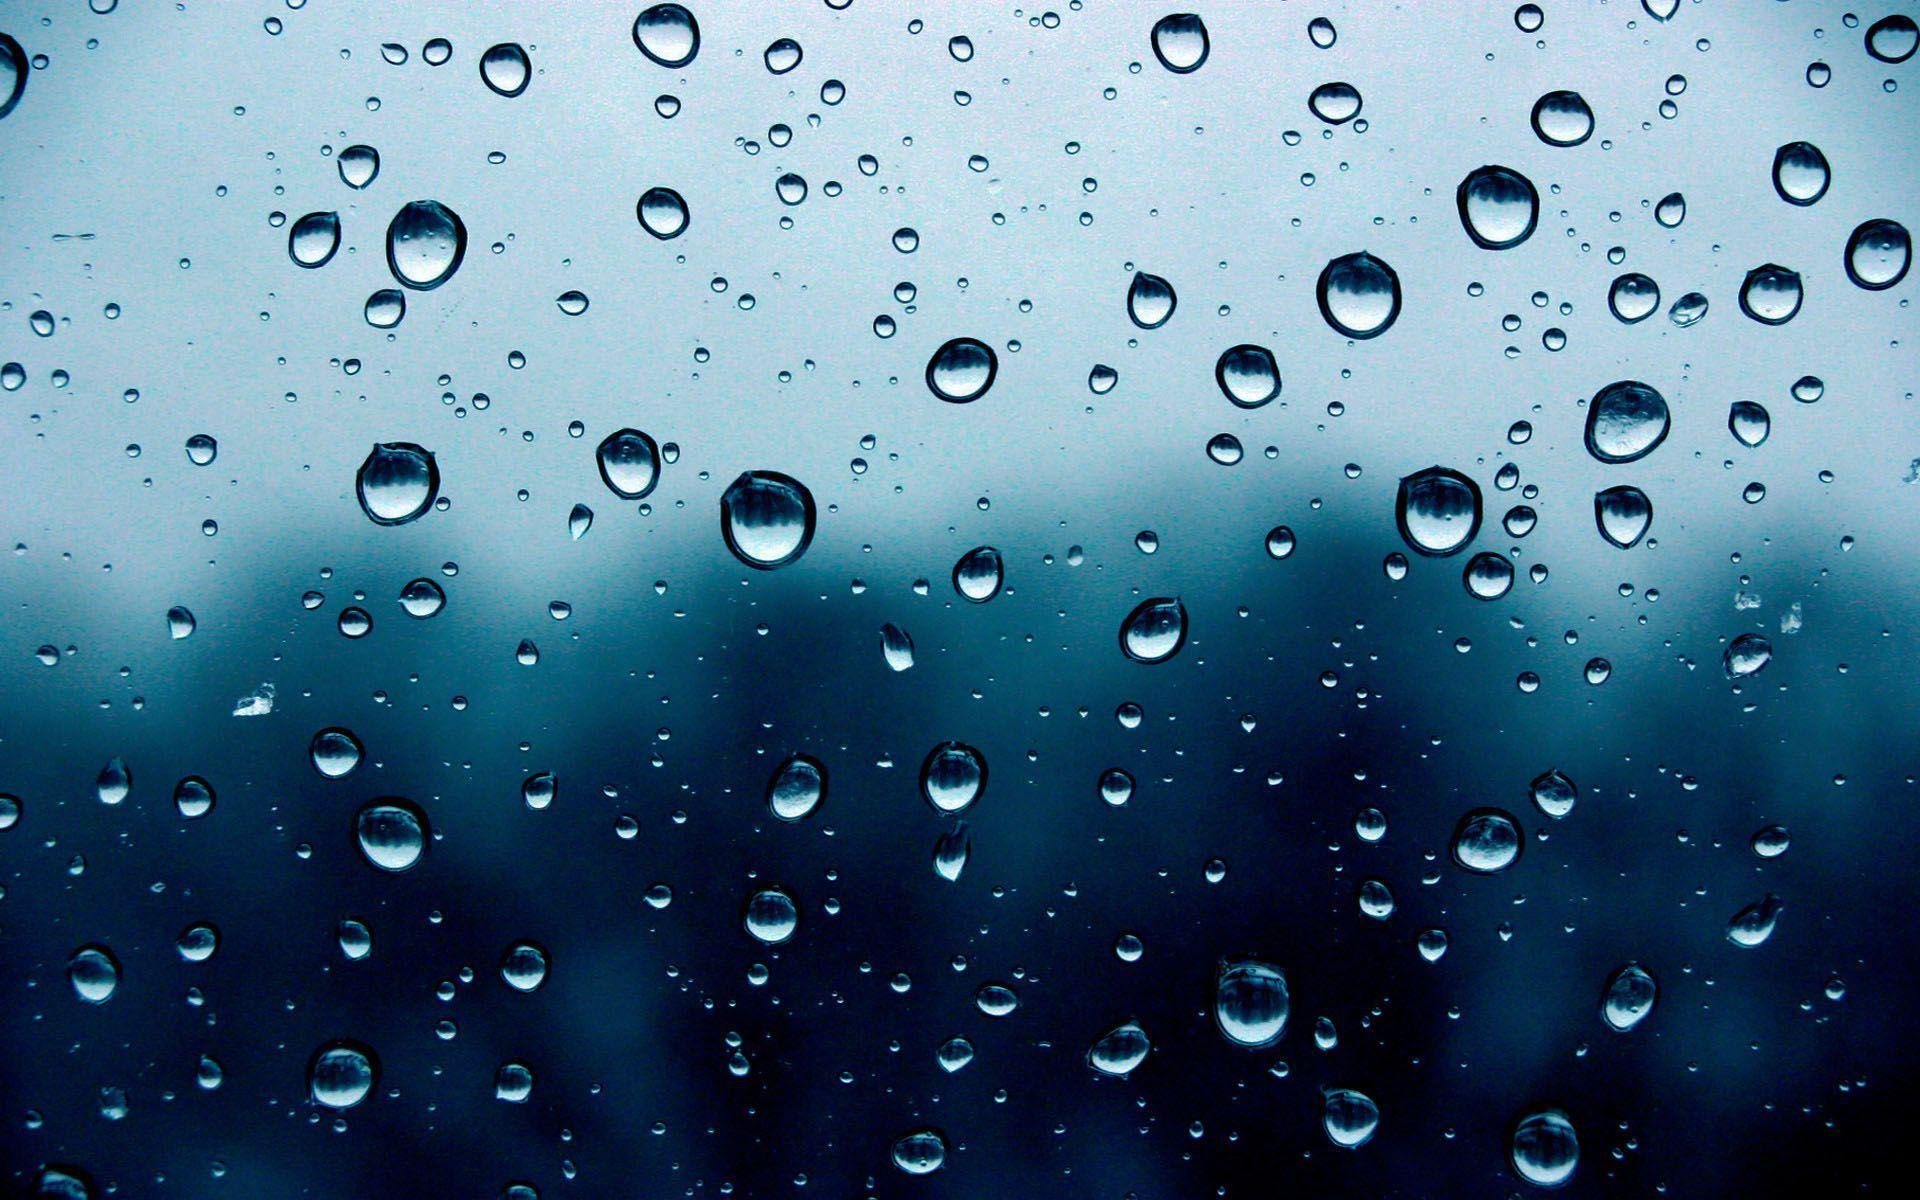 Rainfall Wallpaper Hd - Viewing Gallery